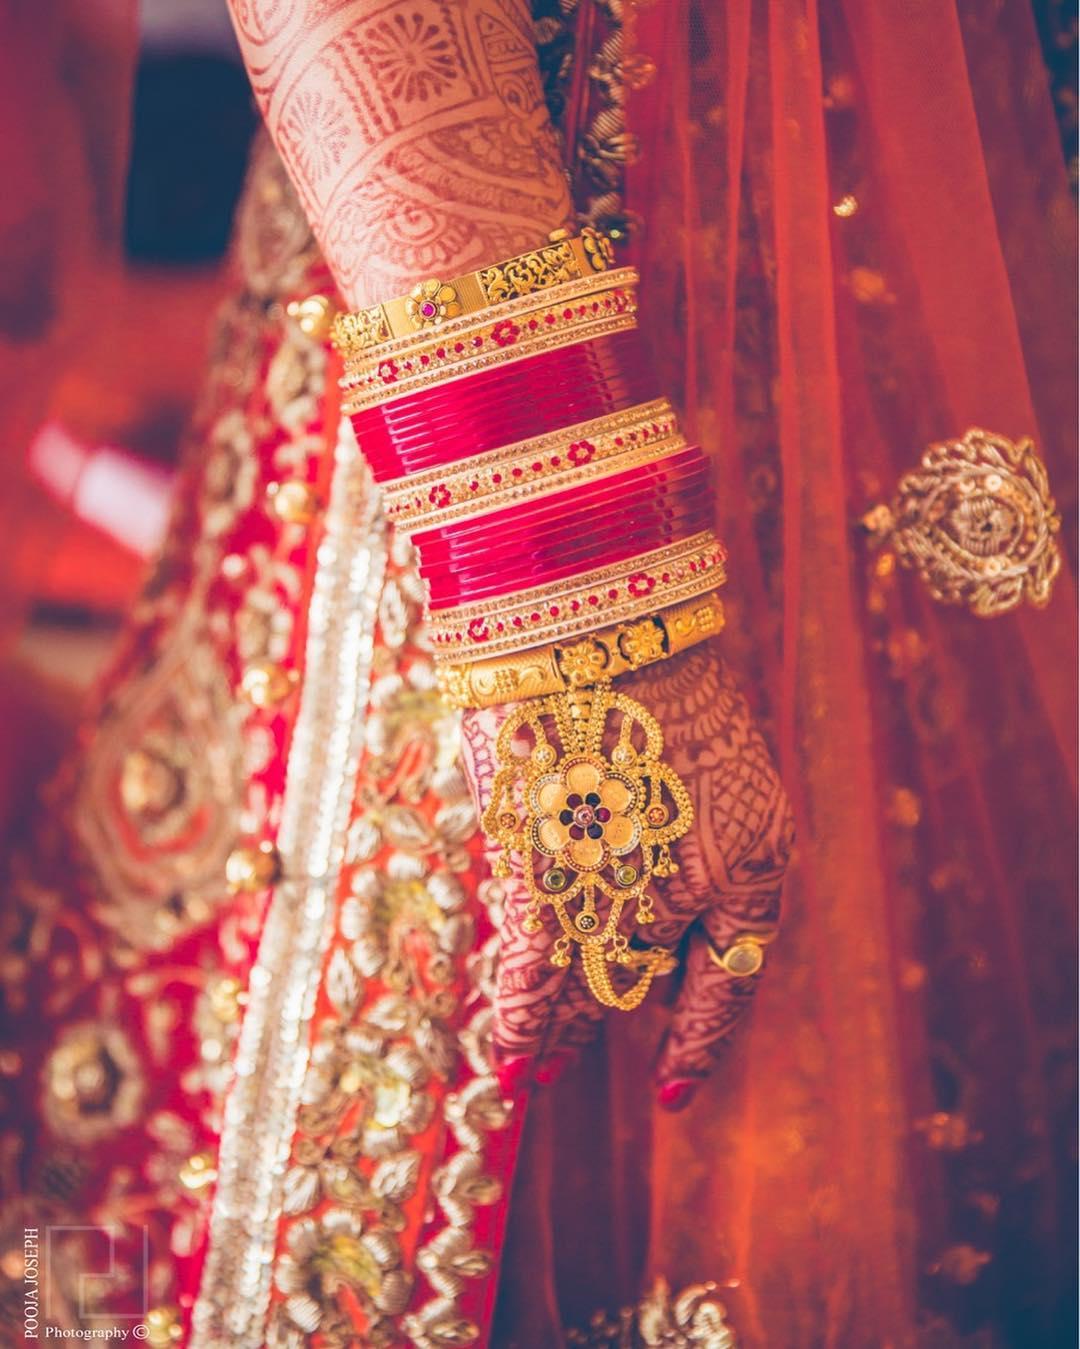 gold jewellery, chooda, gold haathphool, wedding inspiration, wedding jewellery, bride, bridal look, mehendi hands, henna hands, red lehenga, gold ring, bridal jewellery, hathphool ideas